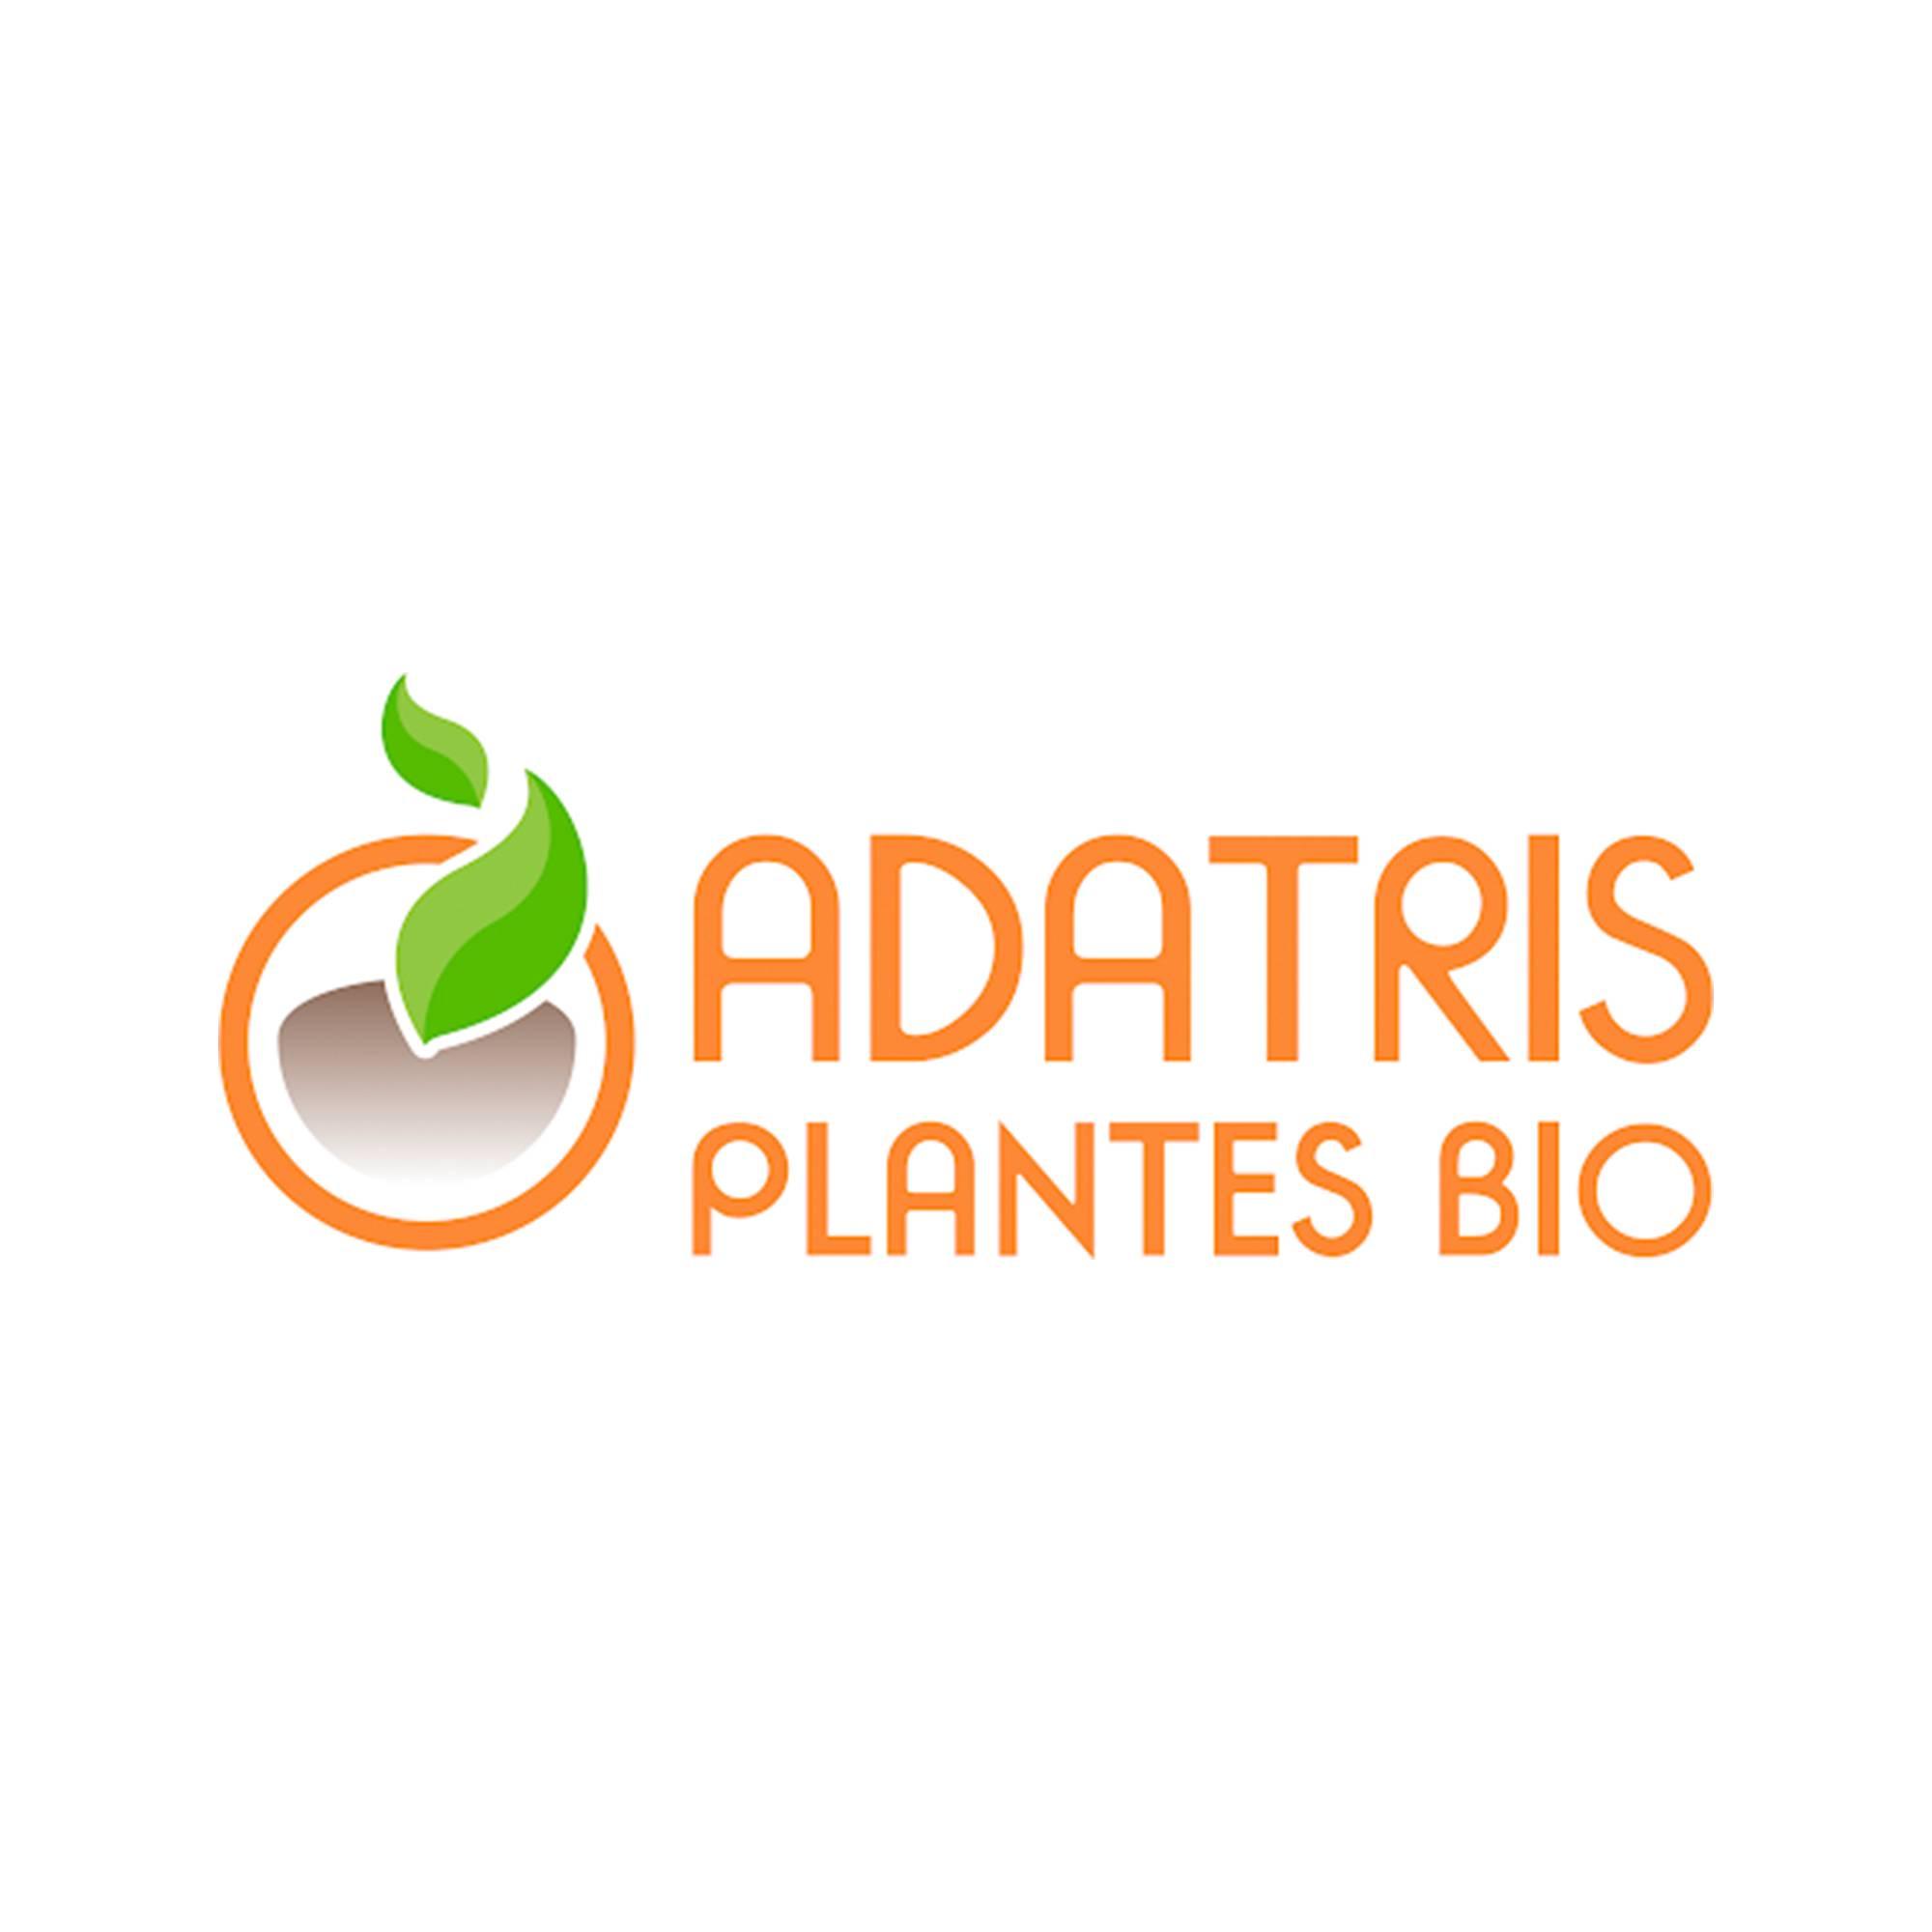 Logo Adatris